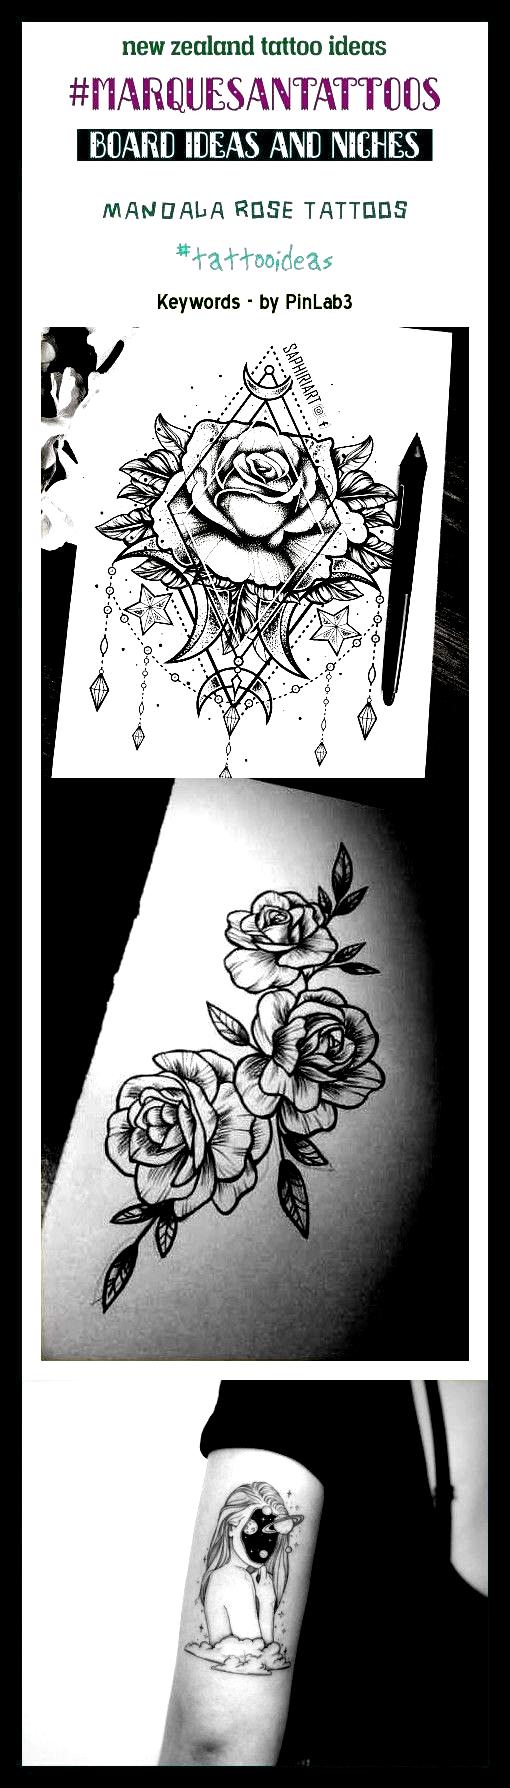 Temporary tattoos new zealand tattoo women, new zealand tattoo dayak tattoo design tattoo men